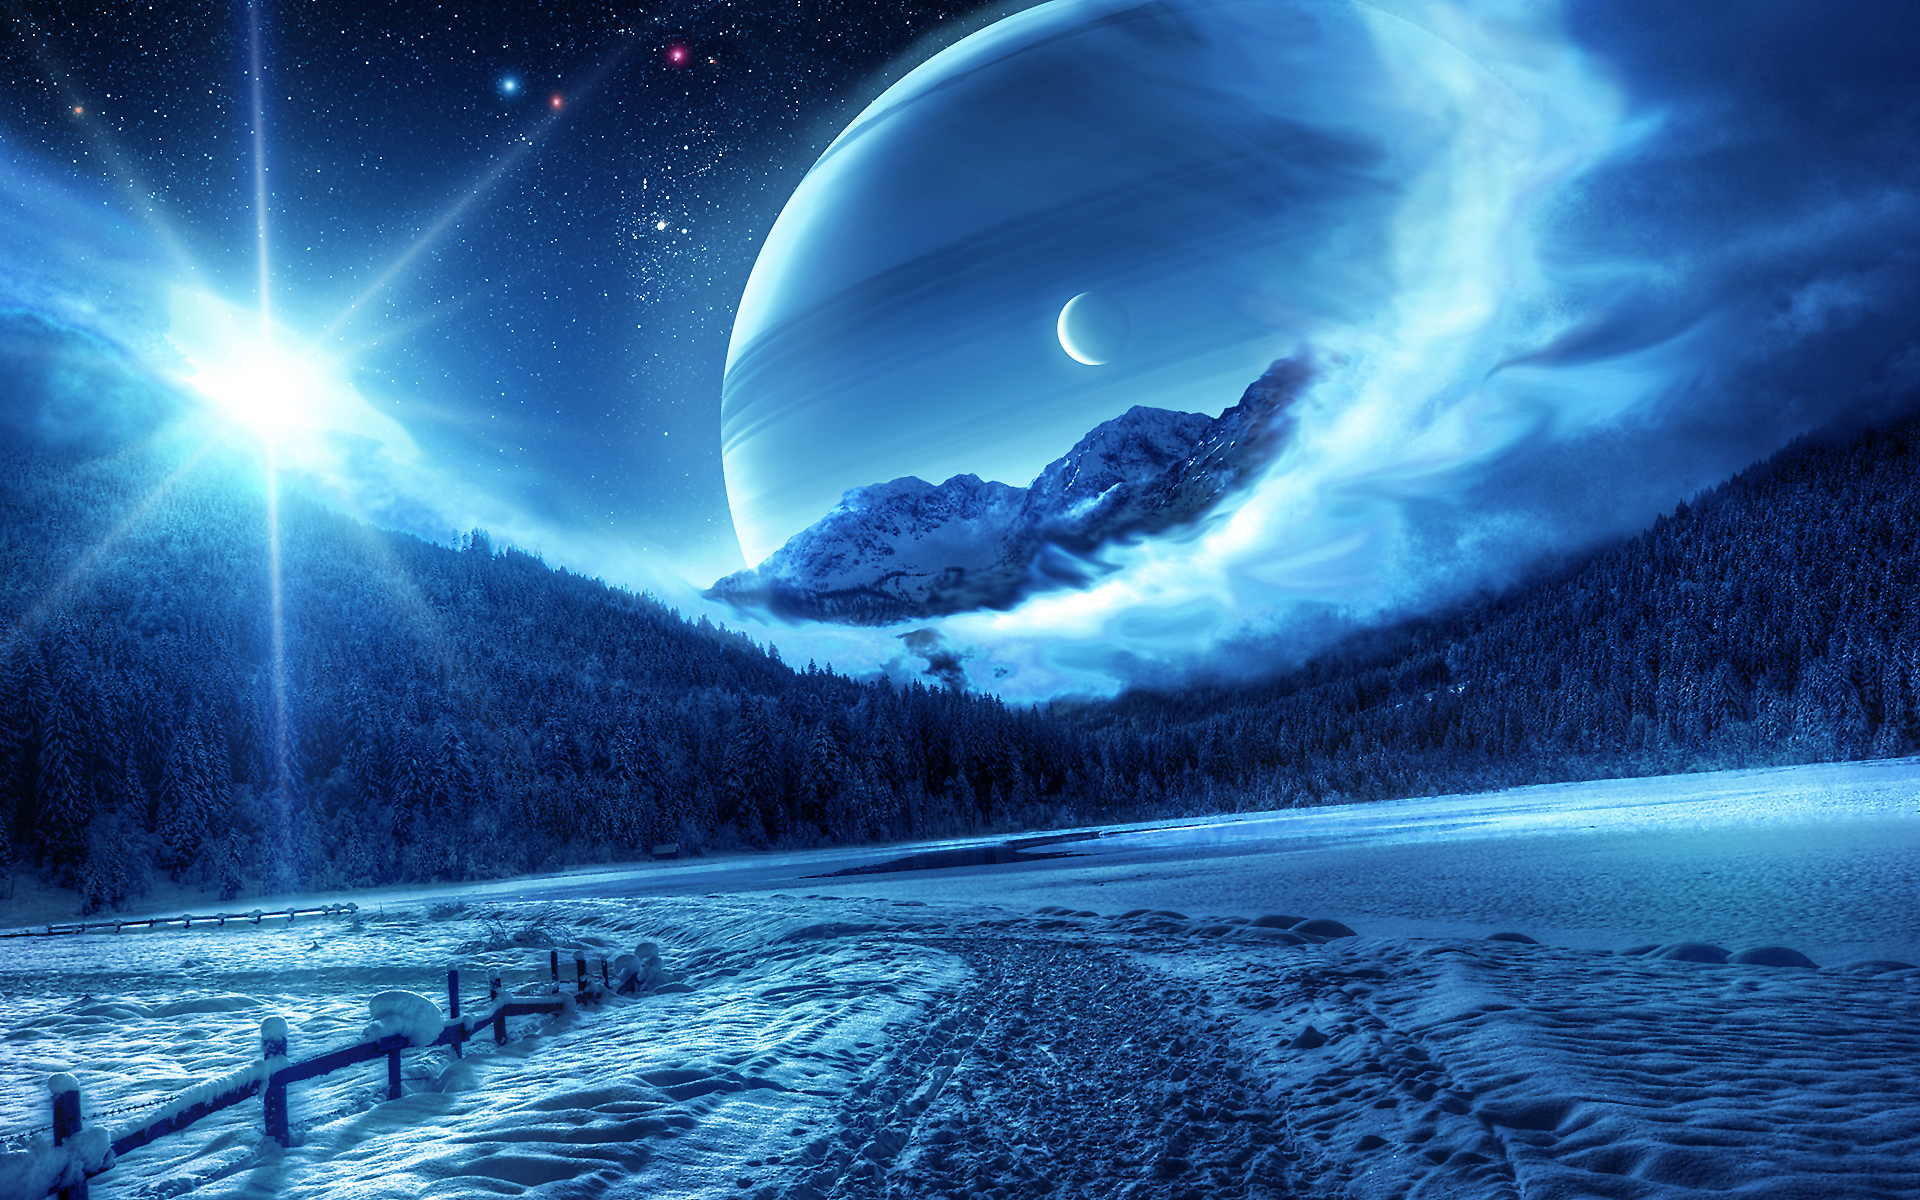 Fantasy Winter Full HD Wallpaper and Background Image | 1920x1200 ... for Fantasy Winter Forest Wallpaper  300lyp